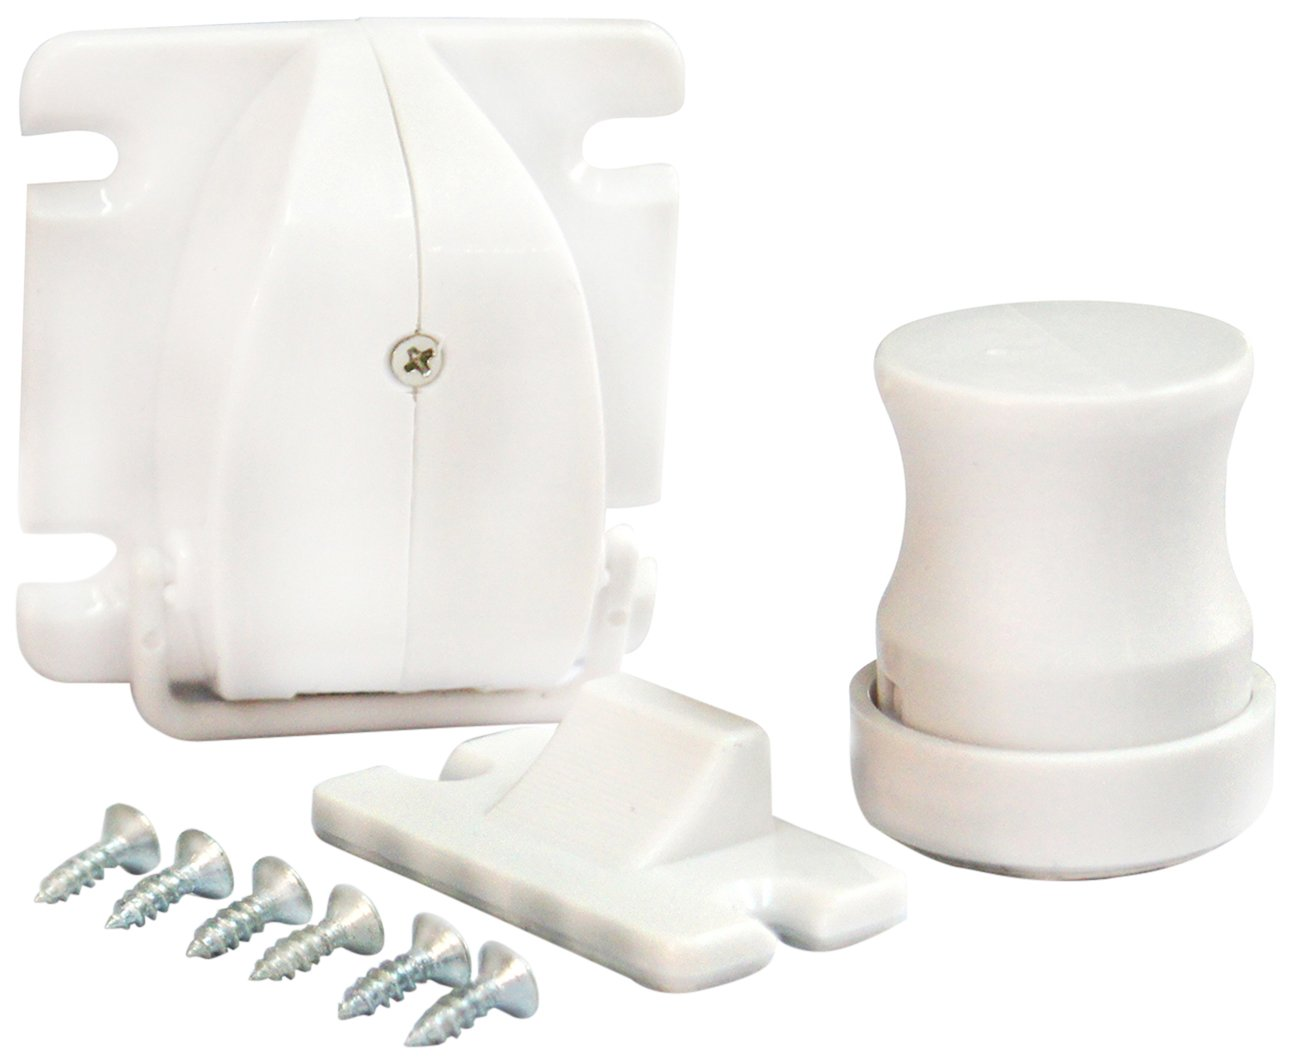 HoooWooo Safety Baby Magnetic Cabinet Locks-No Drilling-4 Locks+1 key